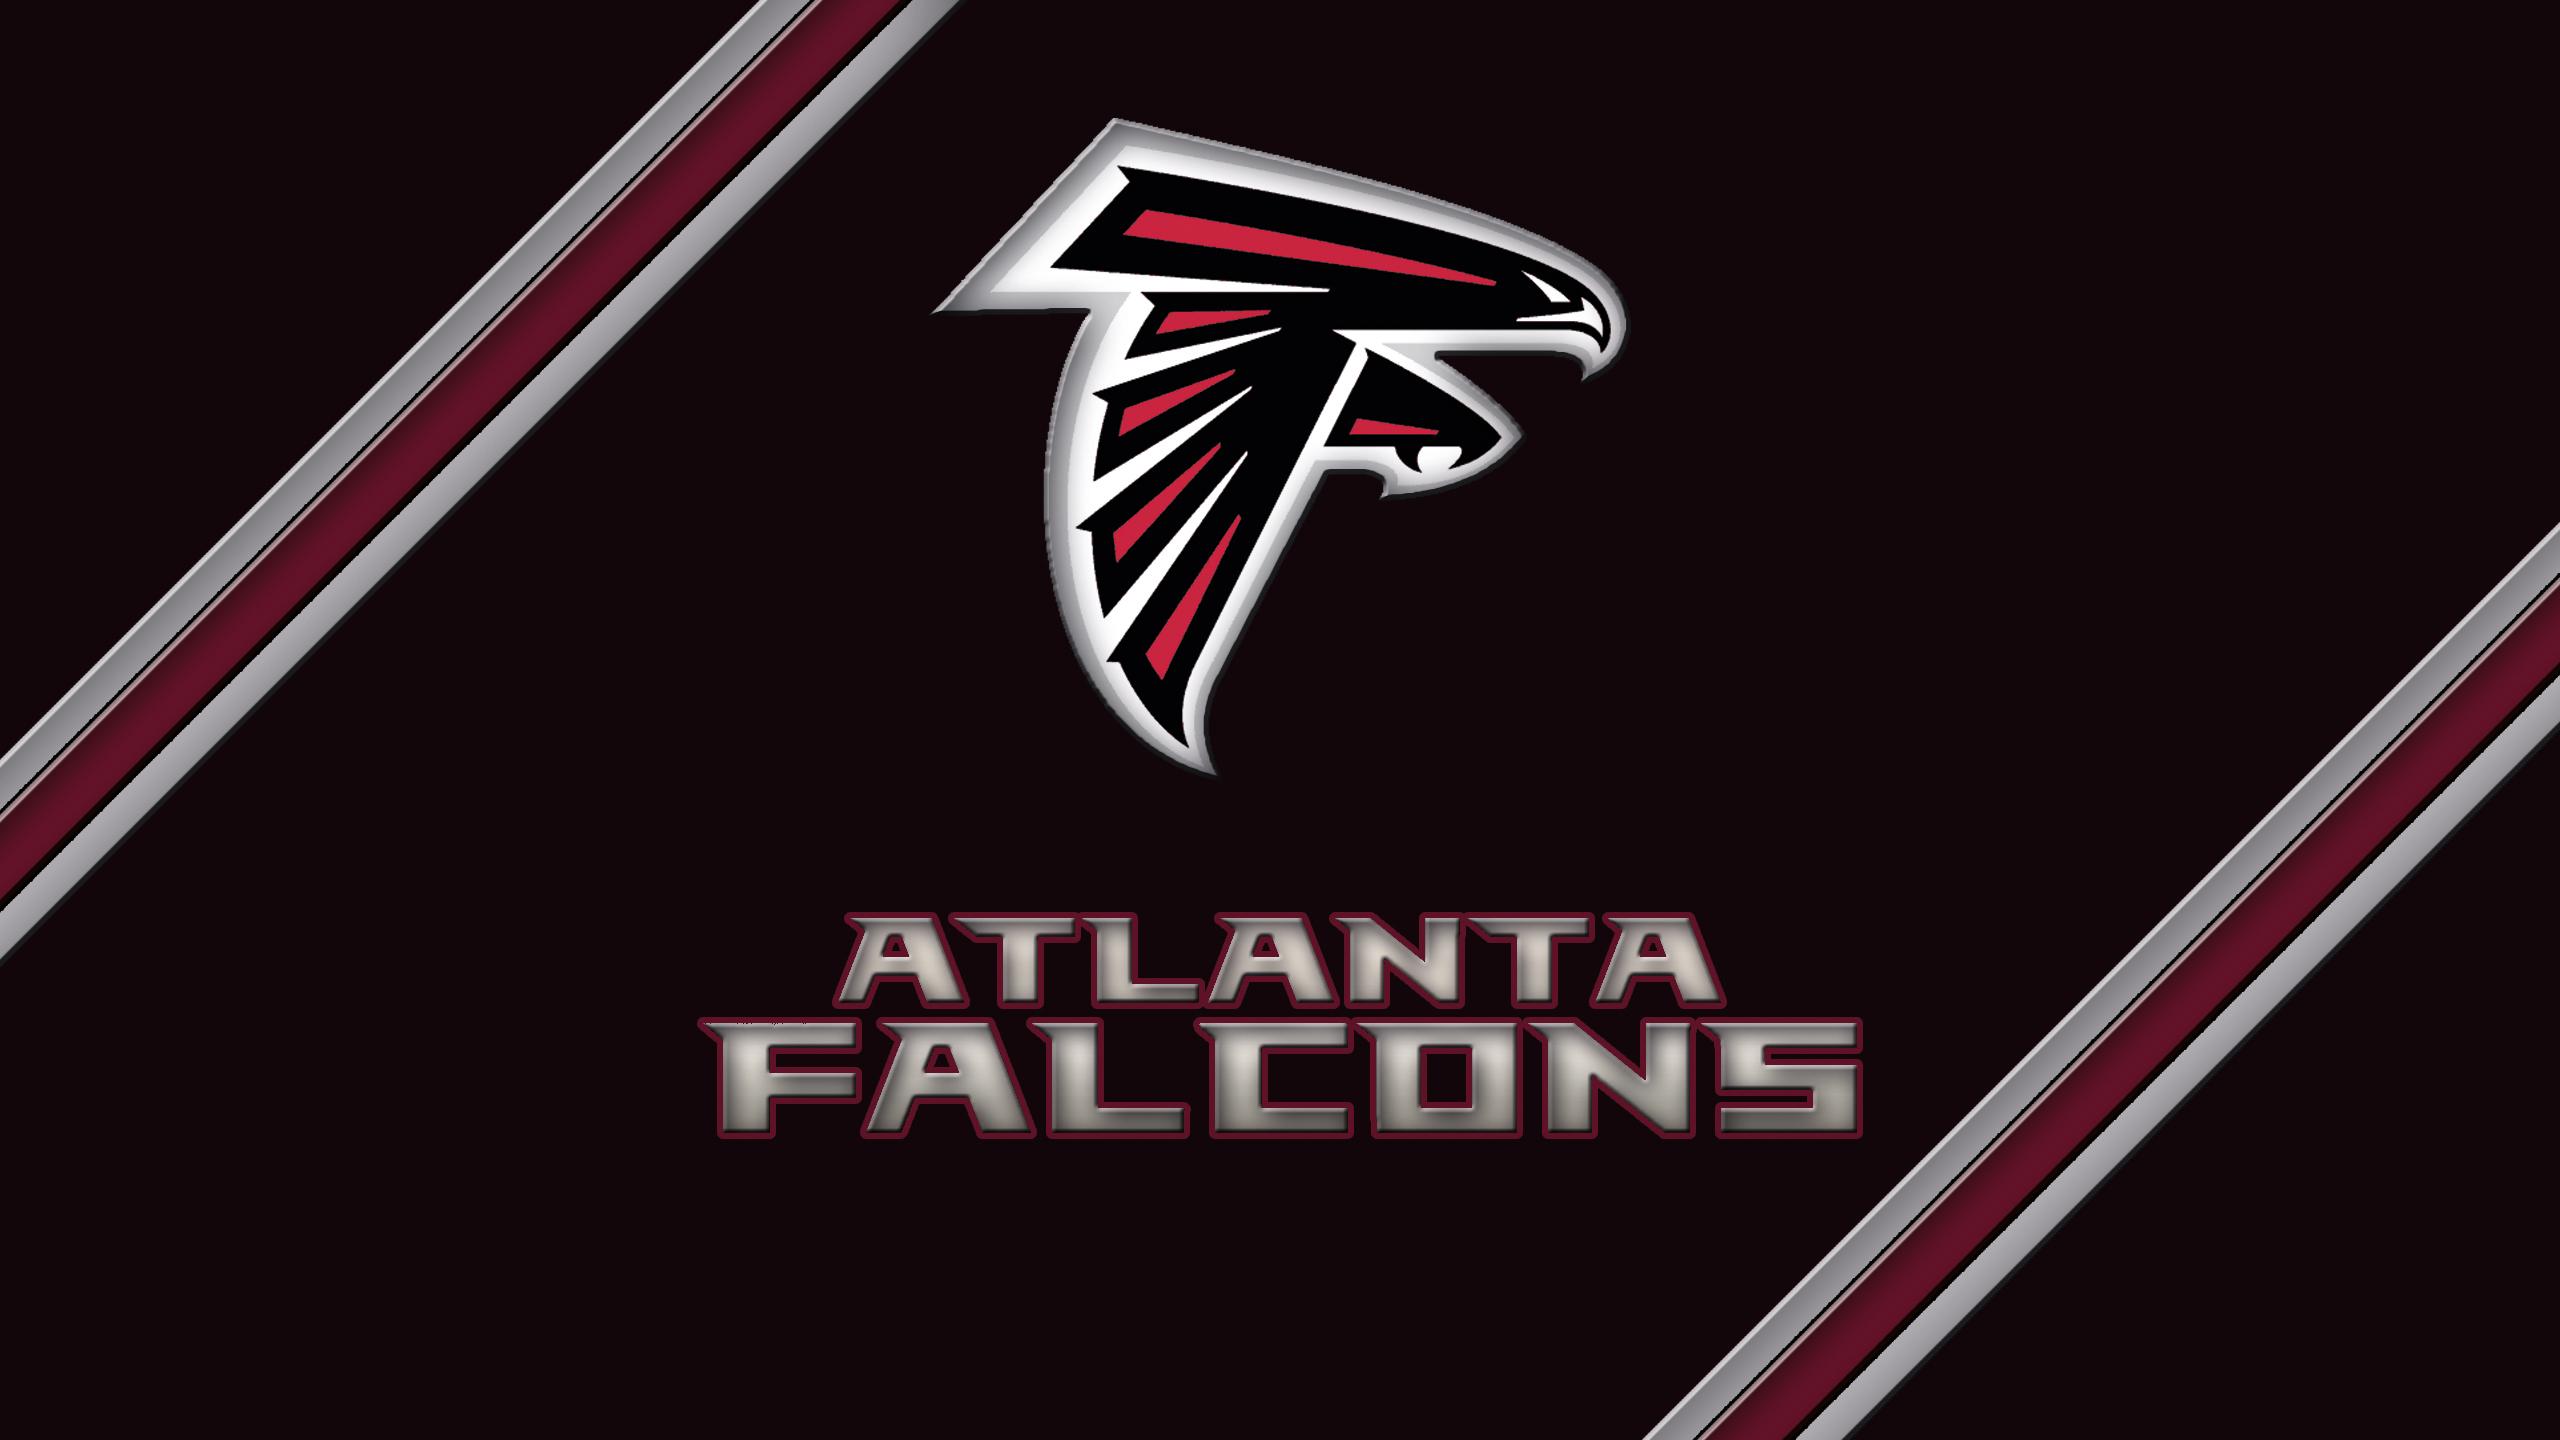 Atlanta Falcons By Beaware8 On Deviantart